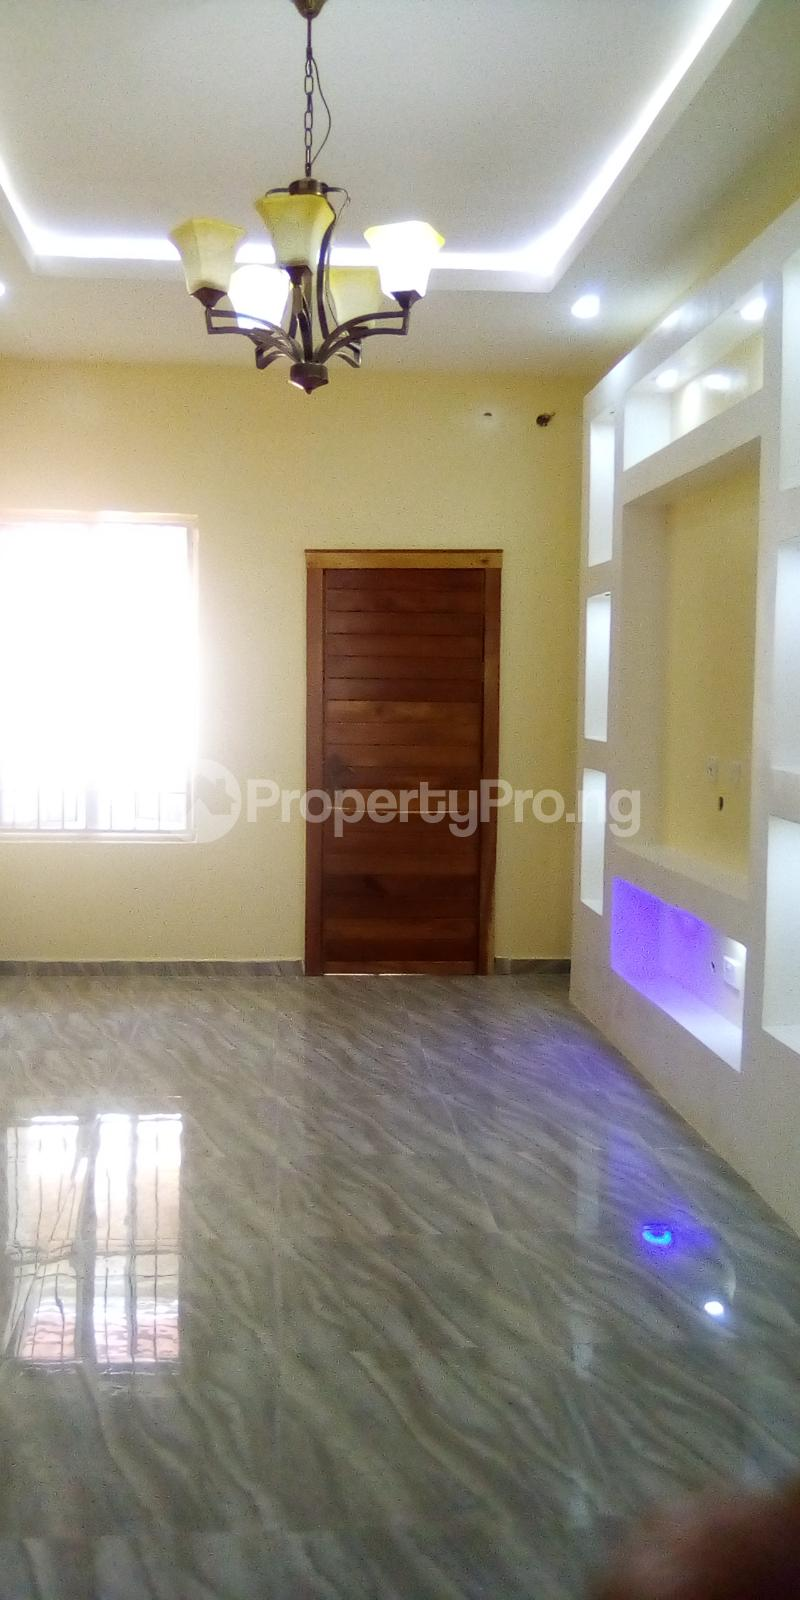 5 bedroom Detached Duplex for sale Southern View Oral Estate Lekki Lagos - 5